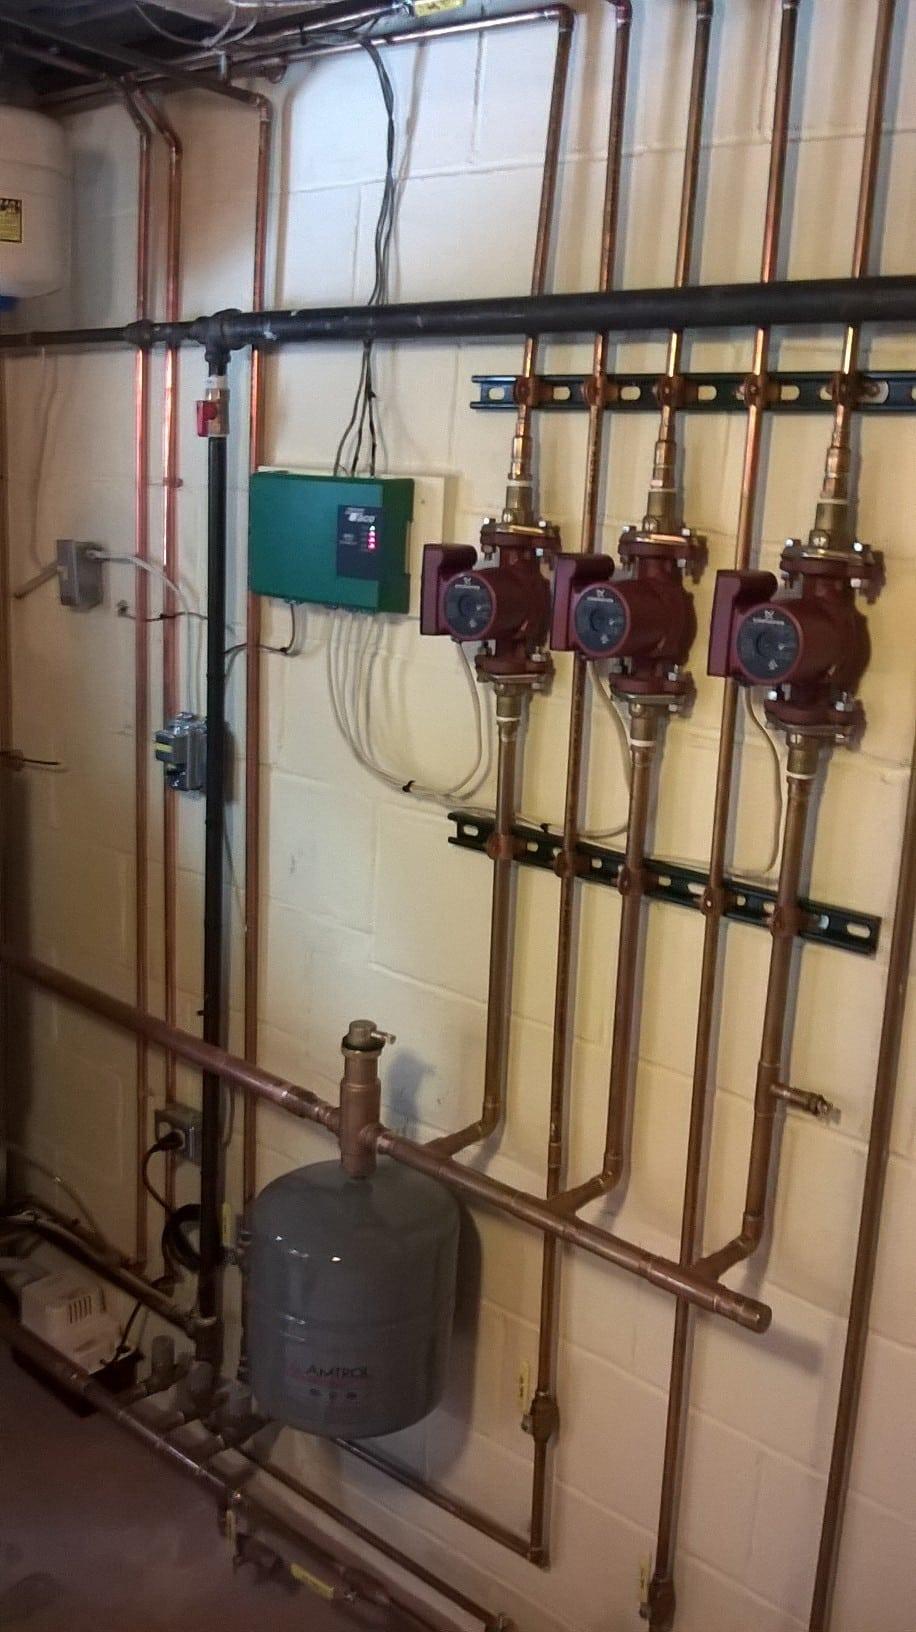 boiler pipes